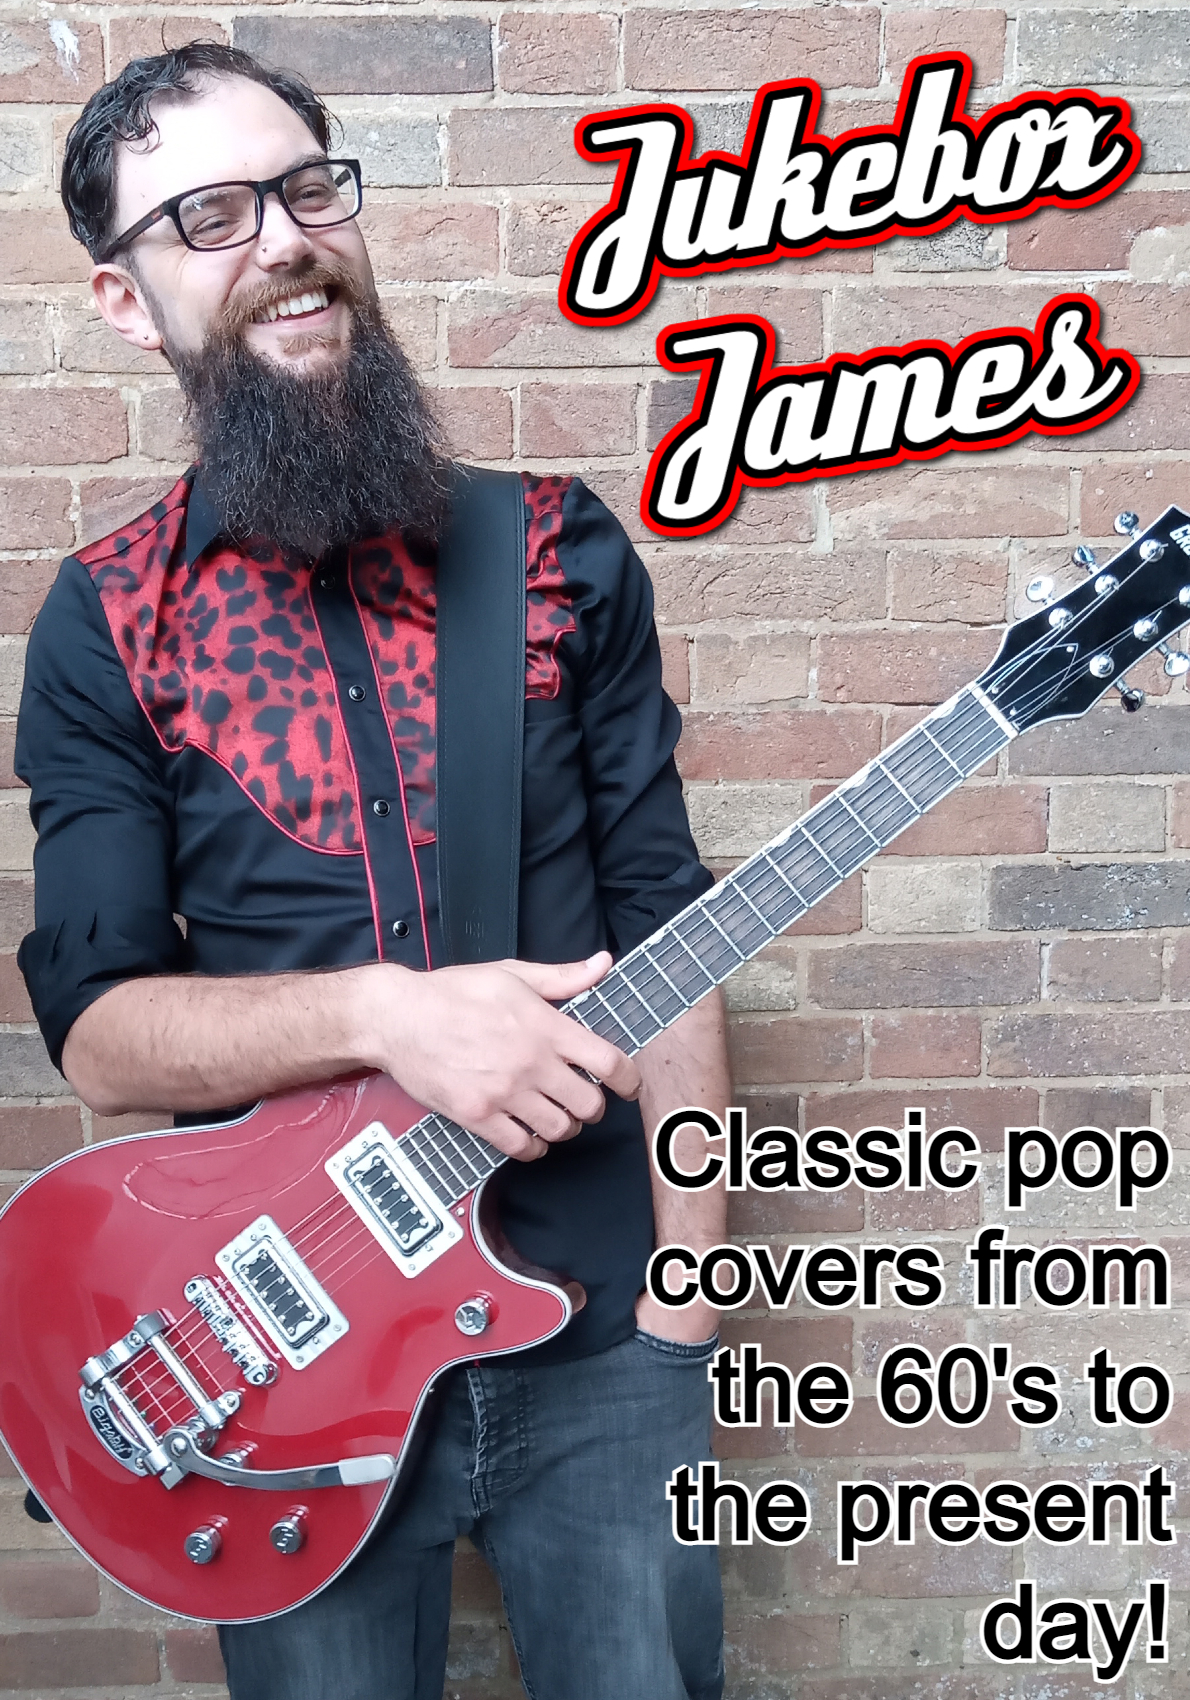 jukebox James